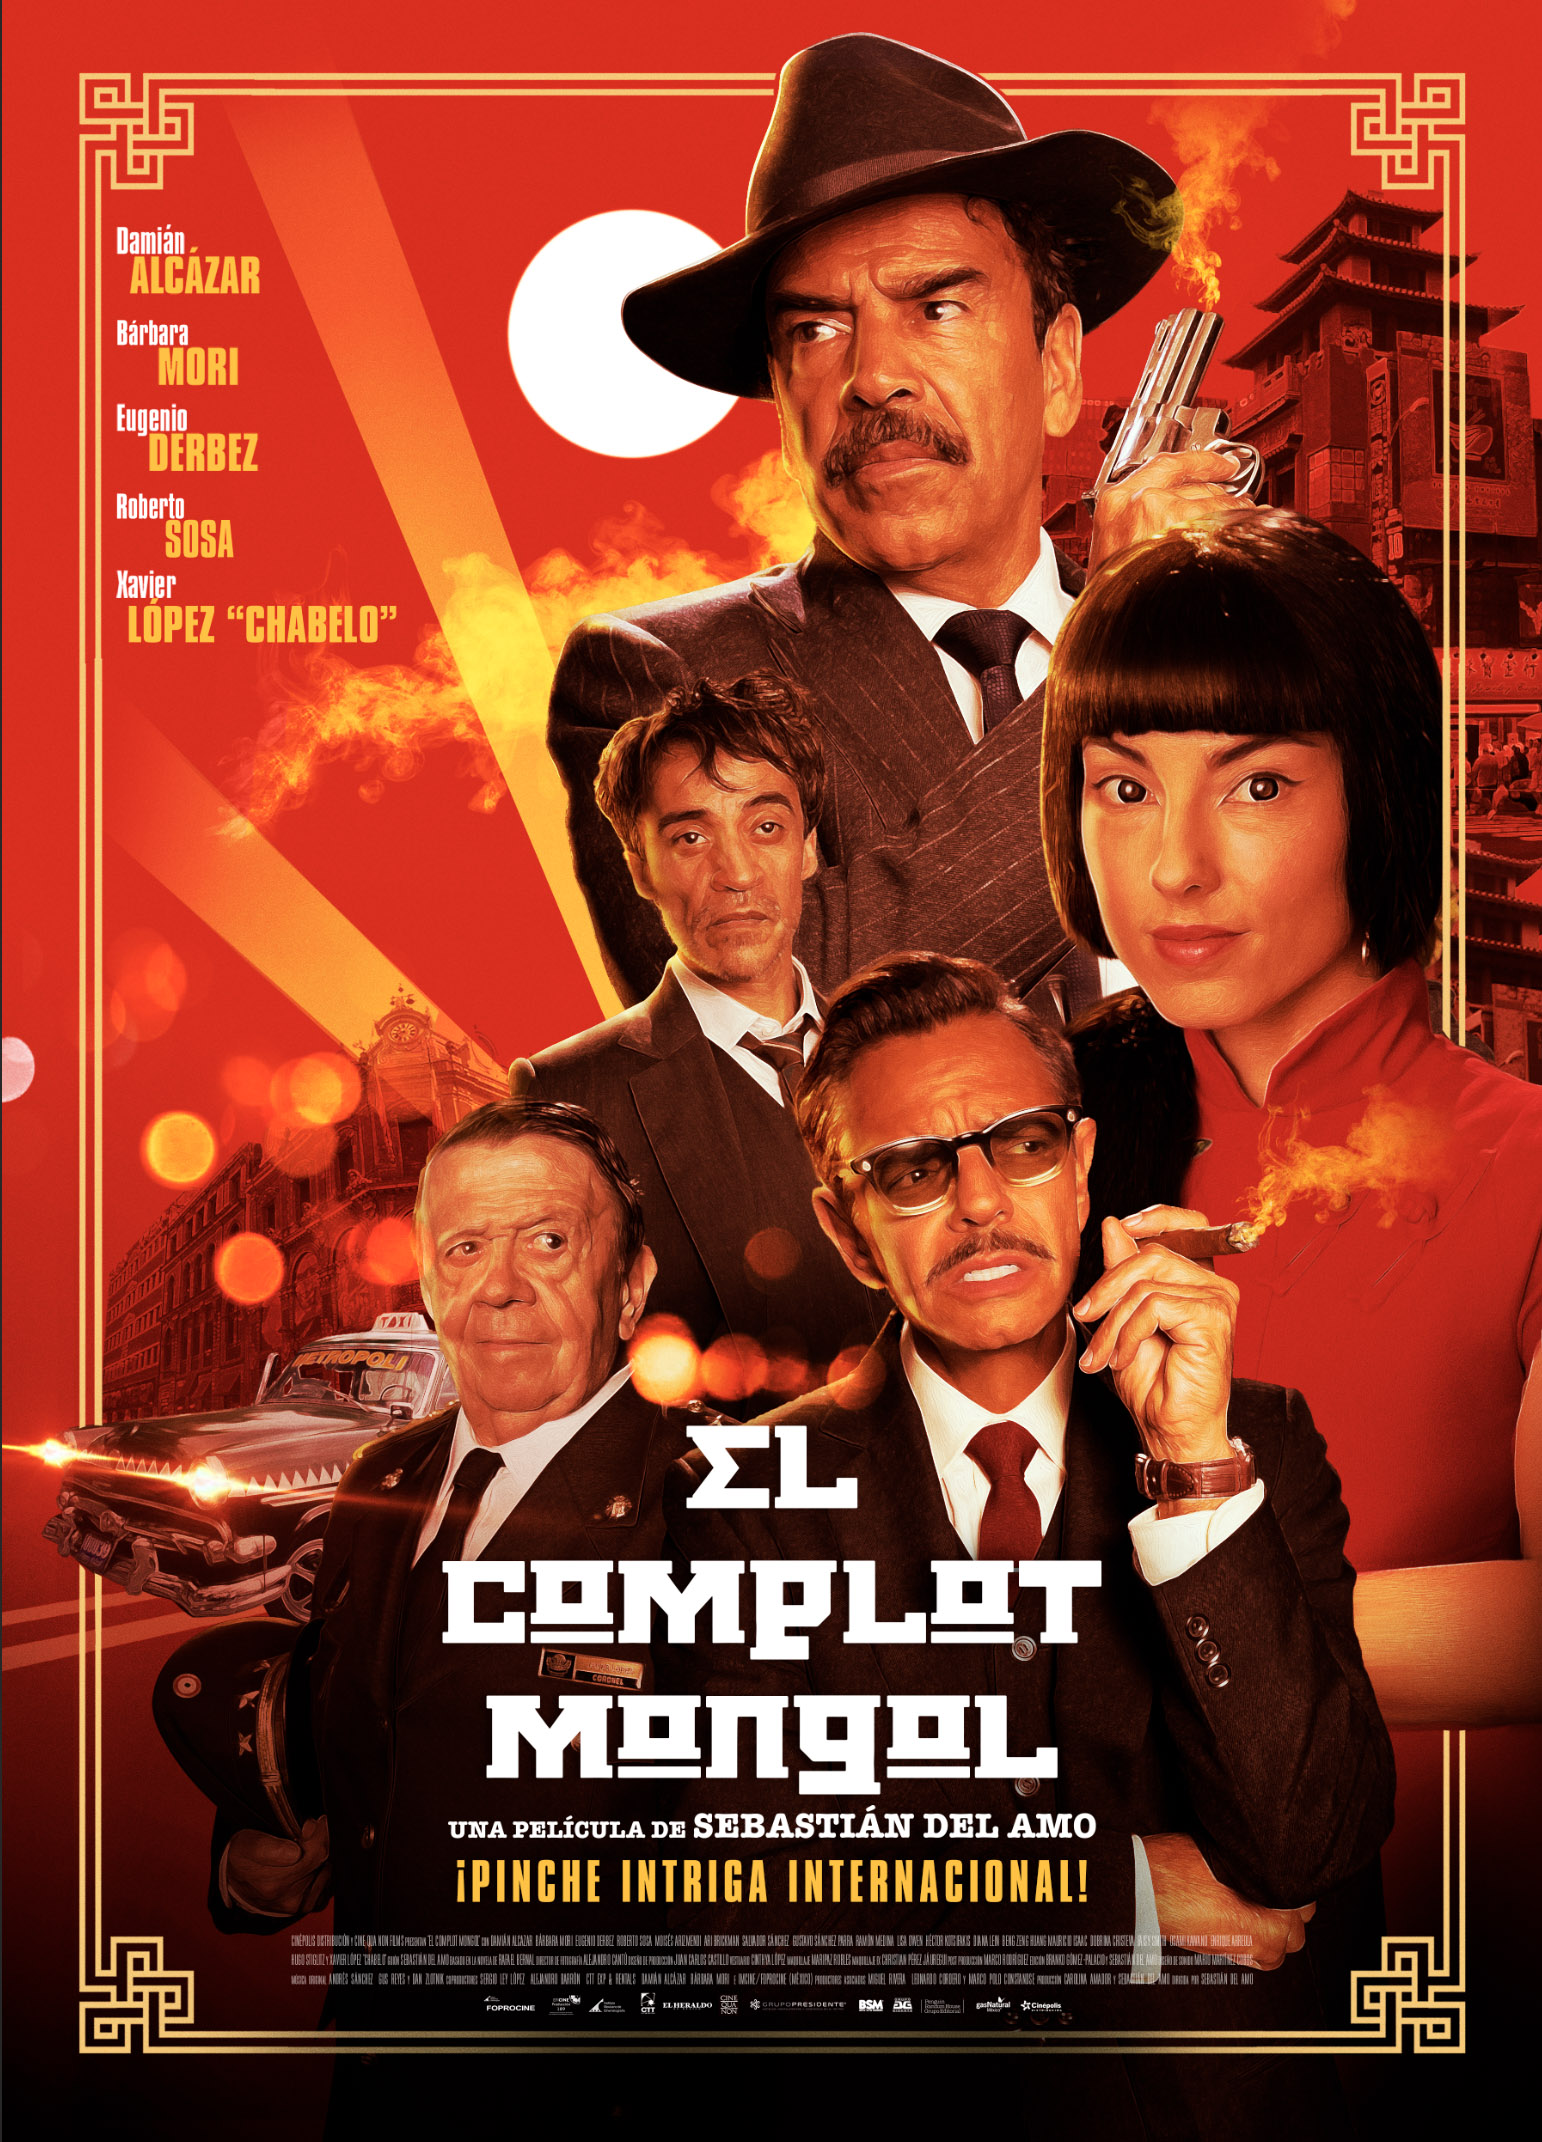 El Complot Mongol (2019) - IMDb